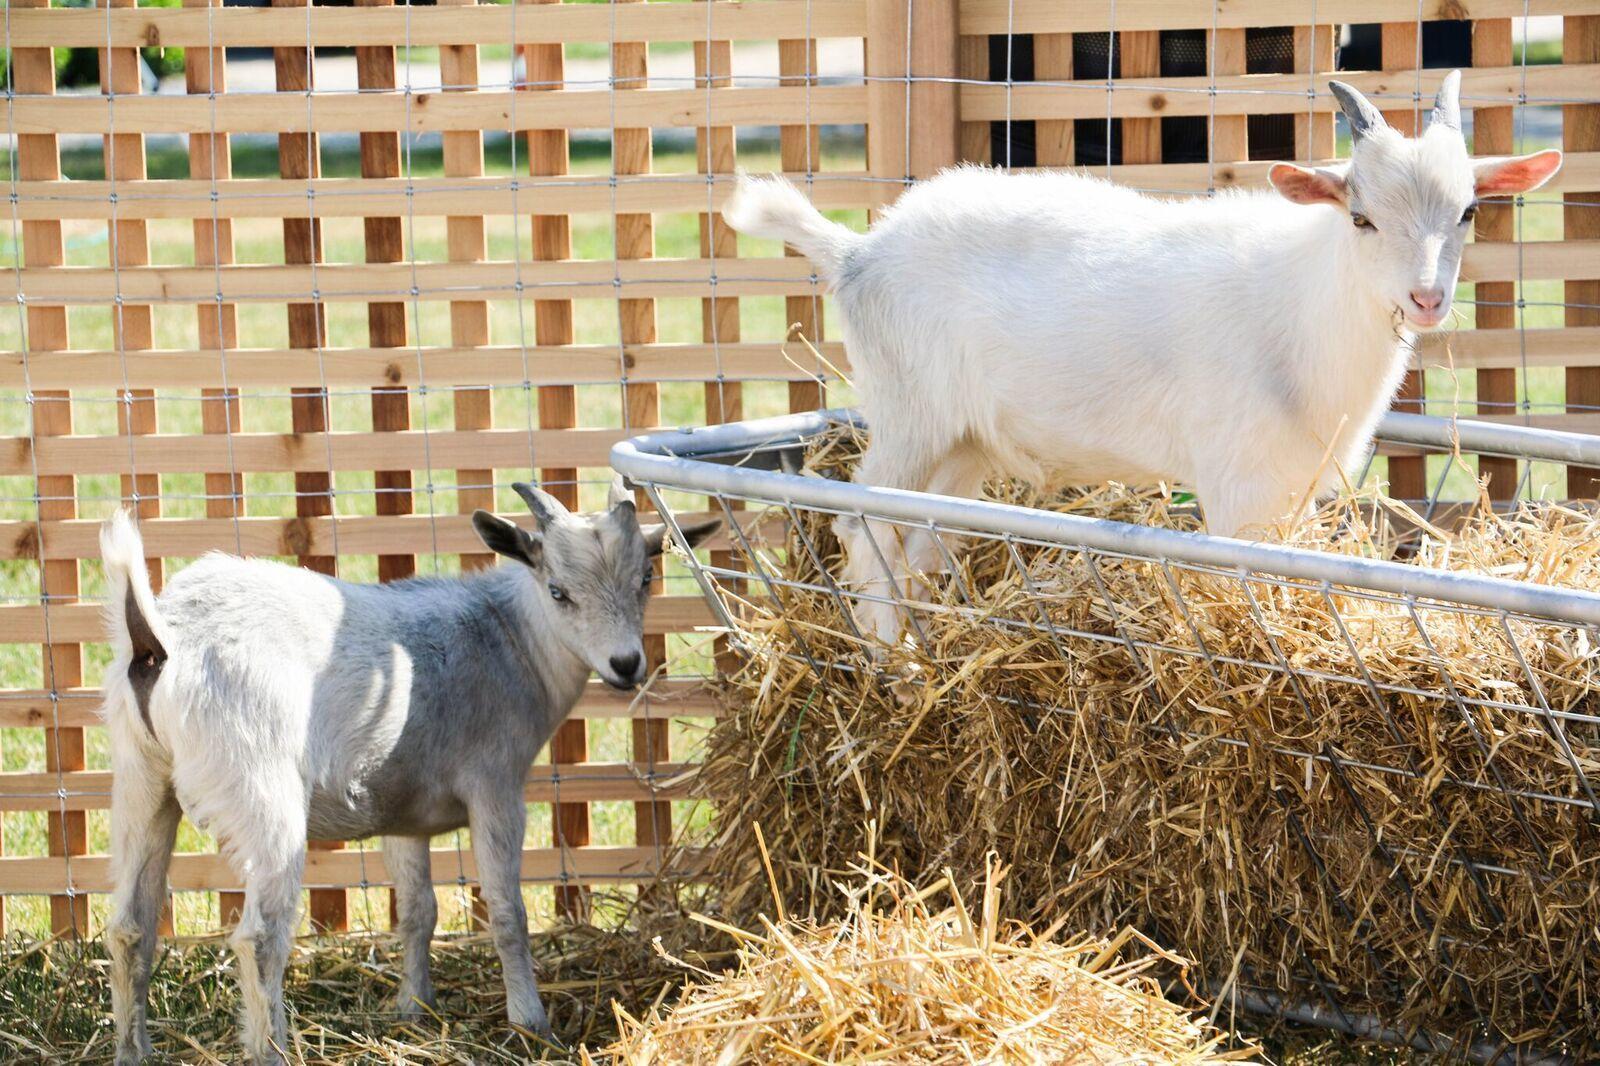 Gurney's Newport - William and Cornelius, the goats